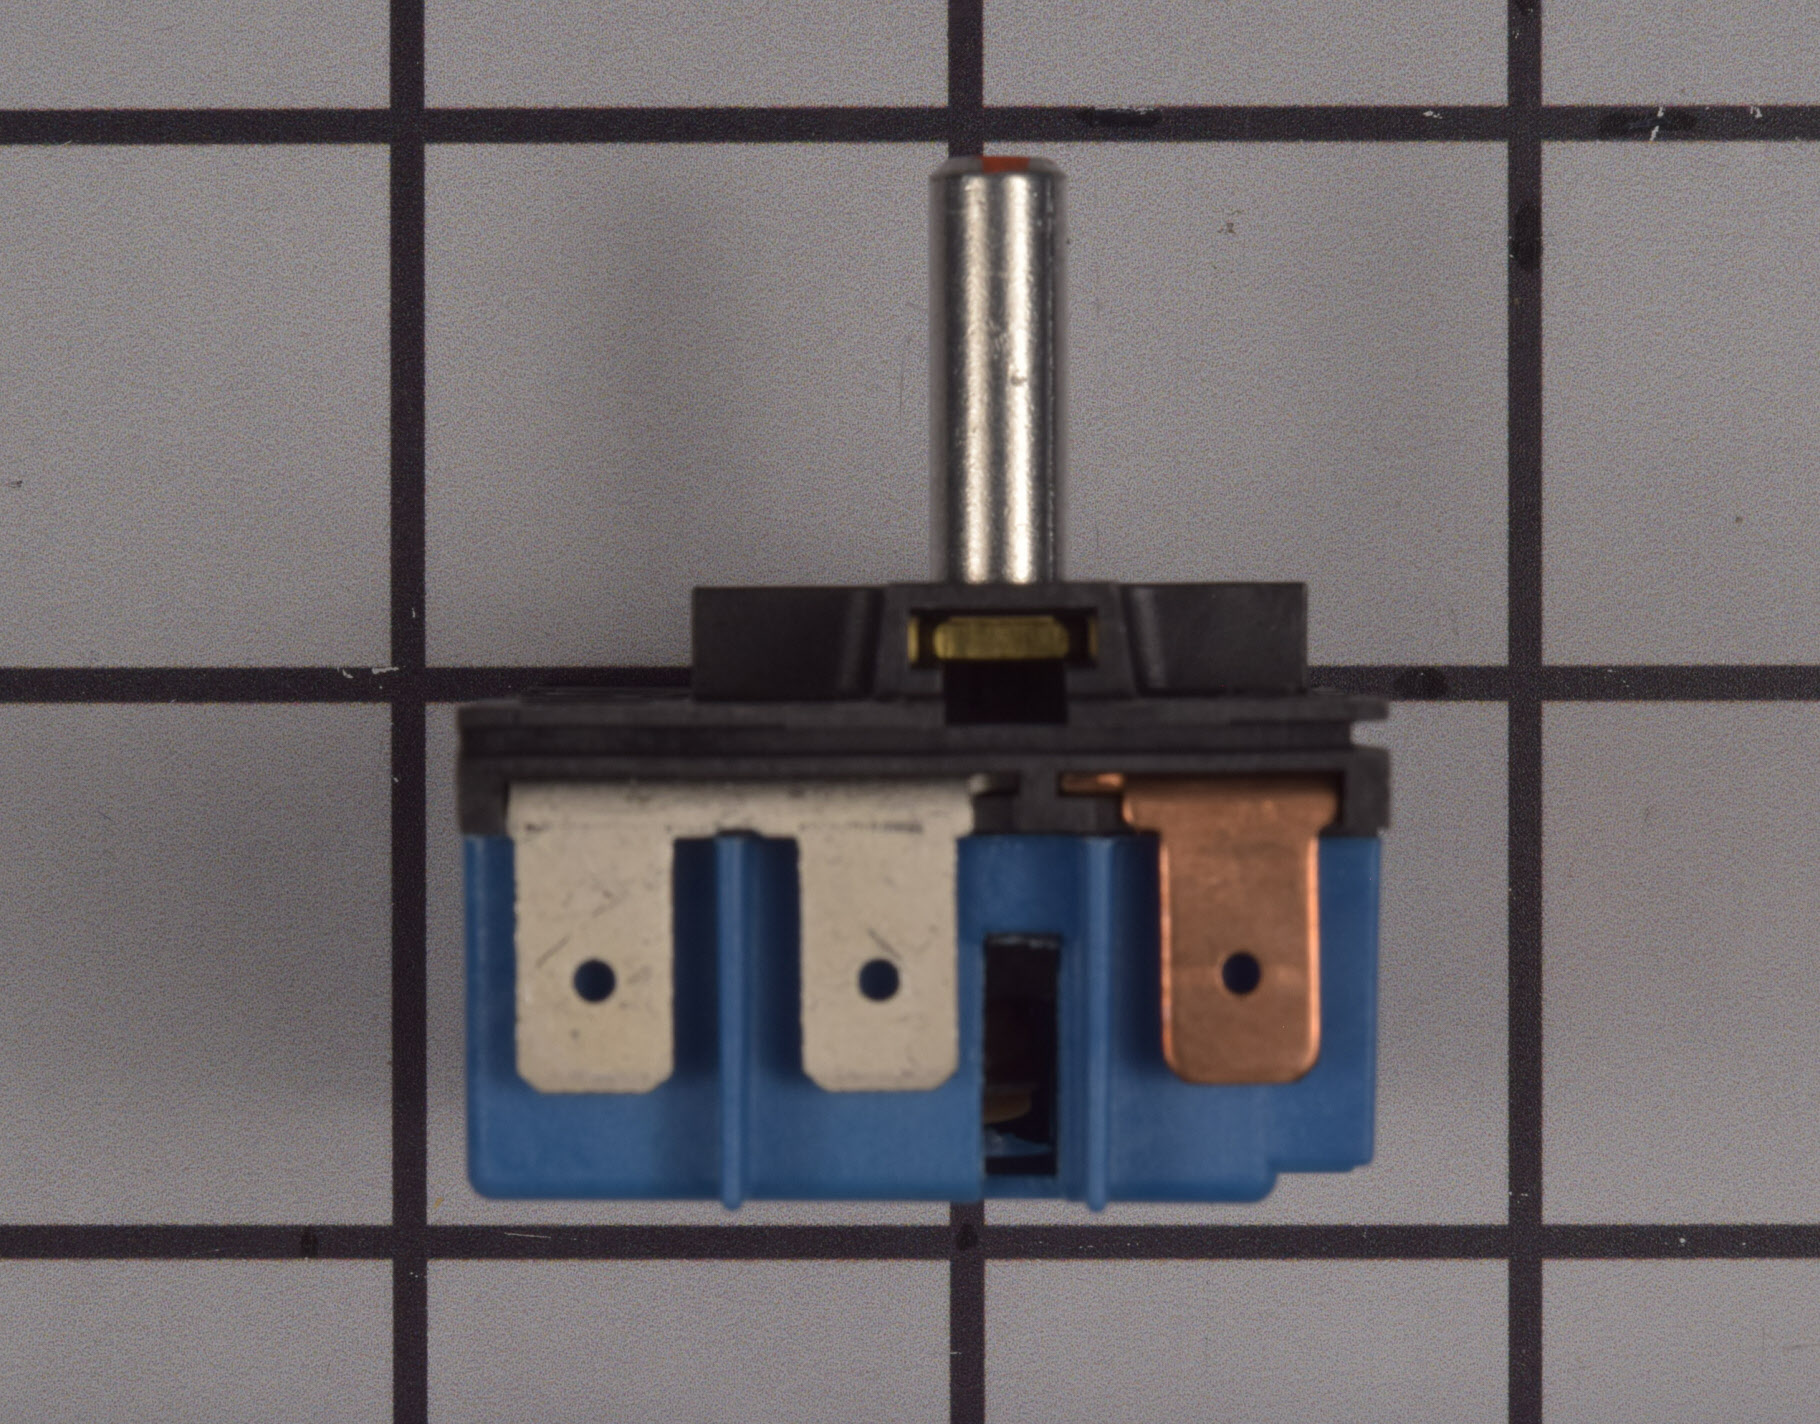 KitchenAid Range/Stove/Oven Part # W10917724 - Surface Element Switch